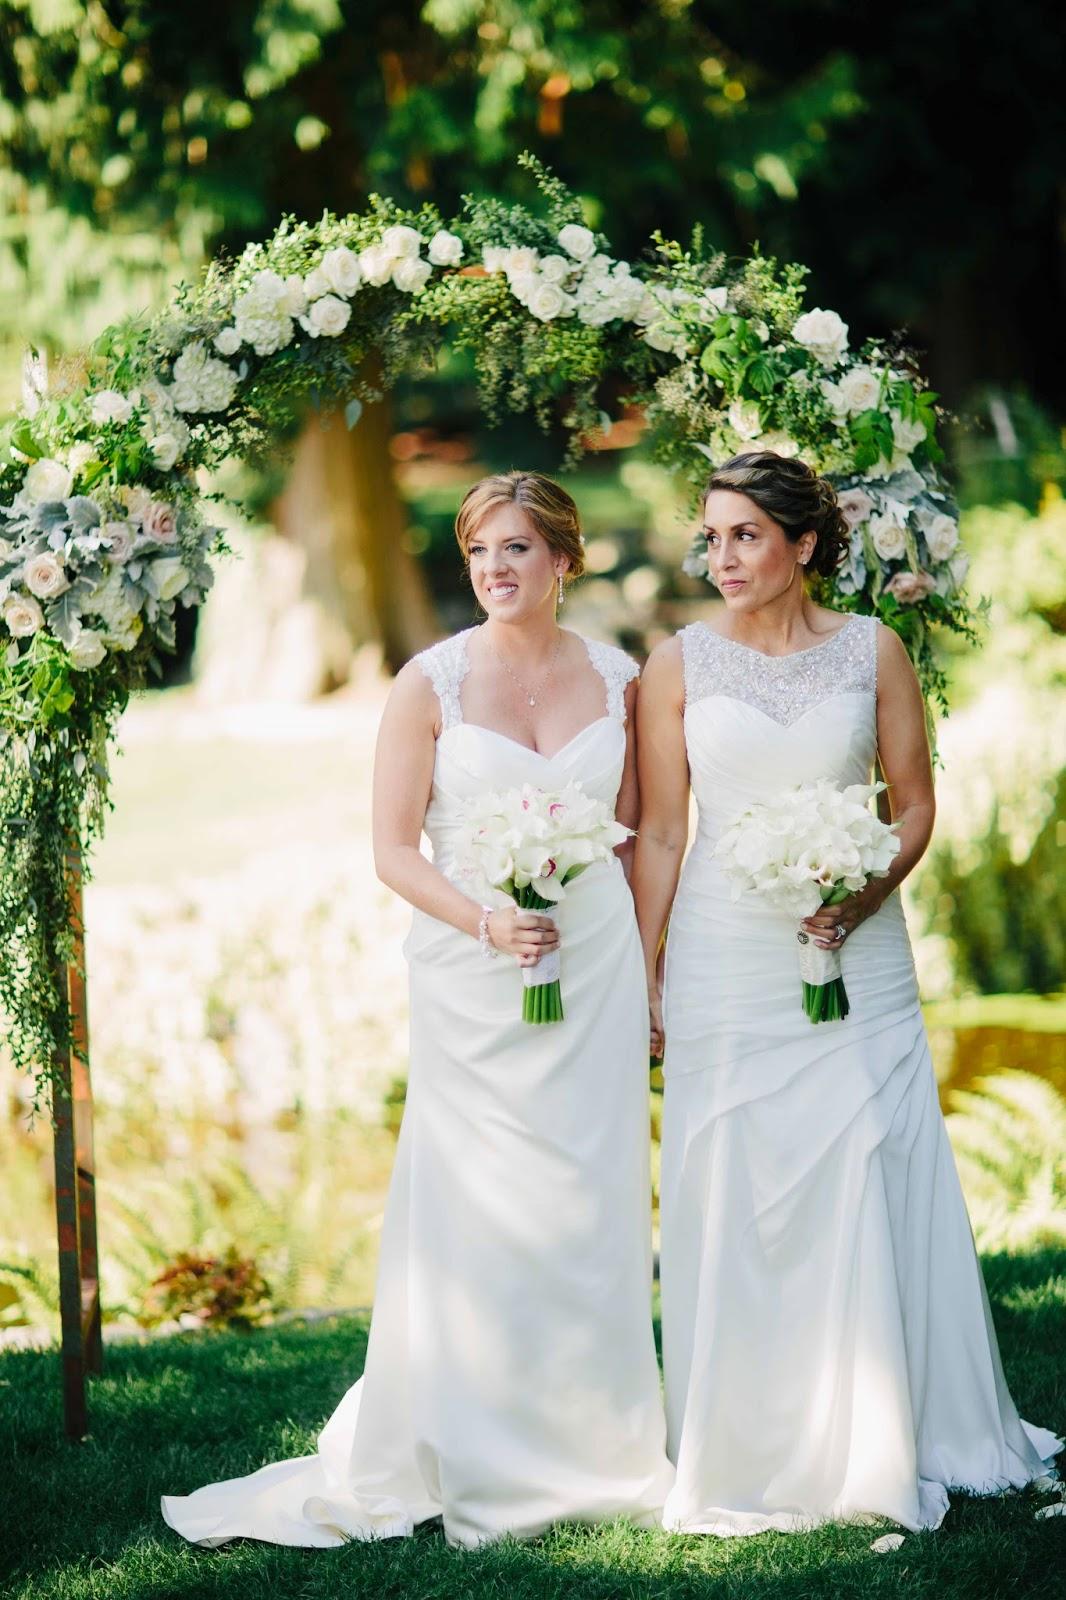 wedding equality, same love, one love